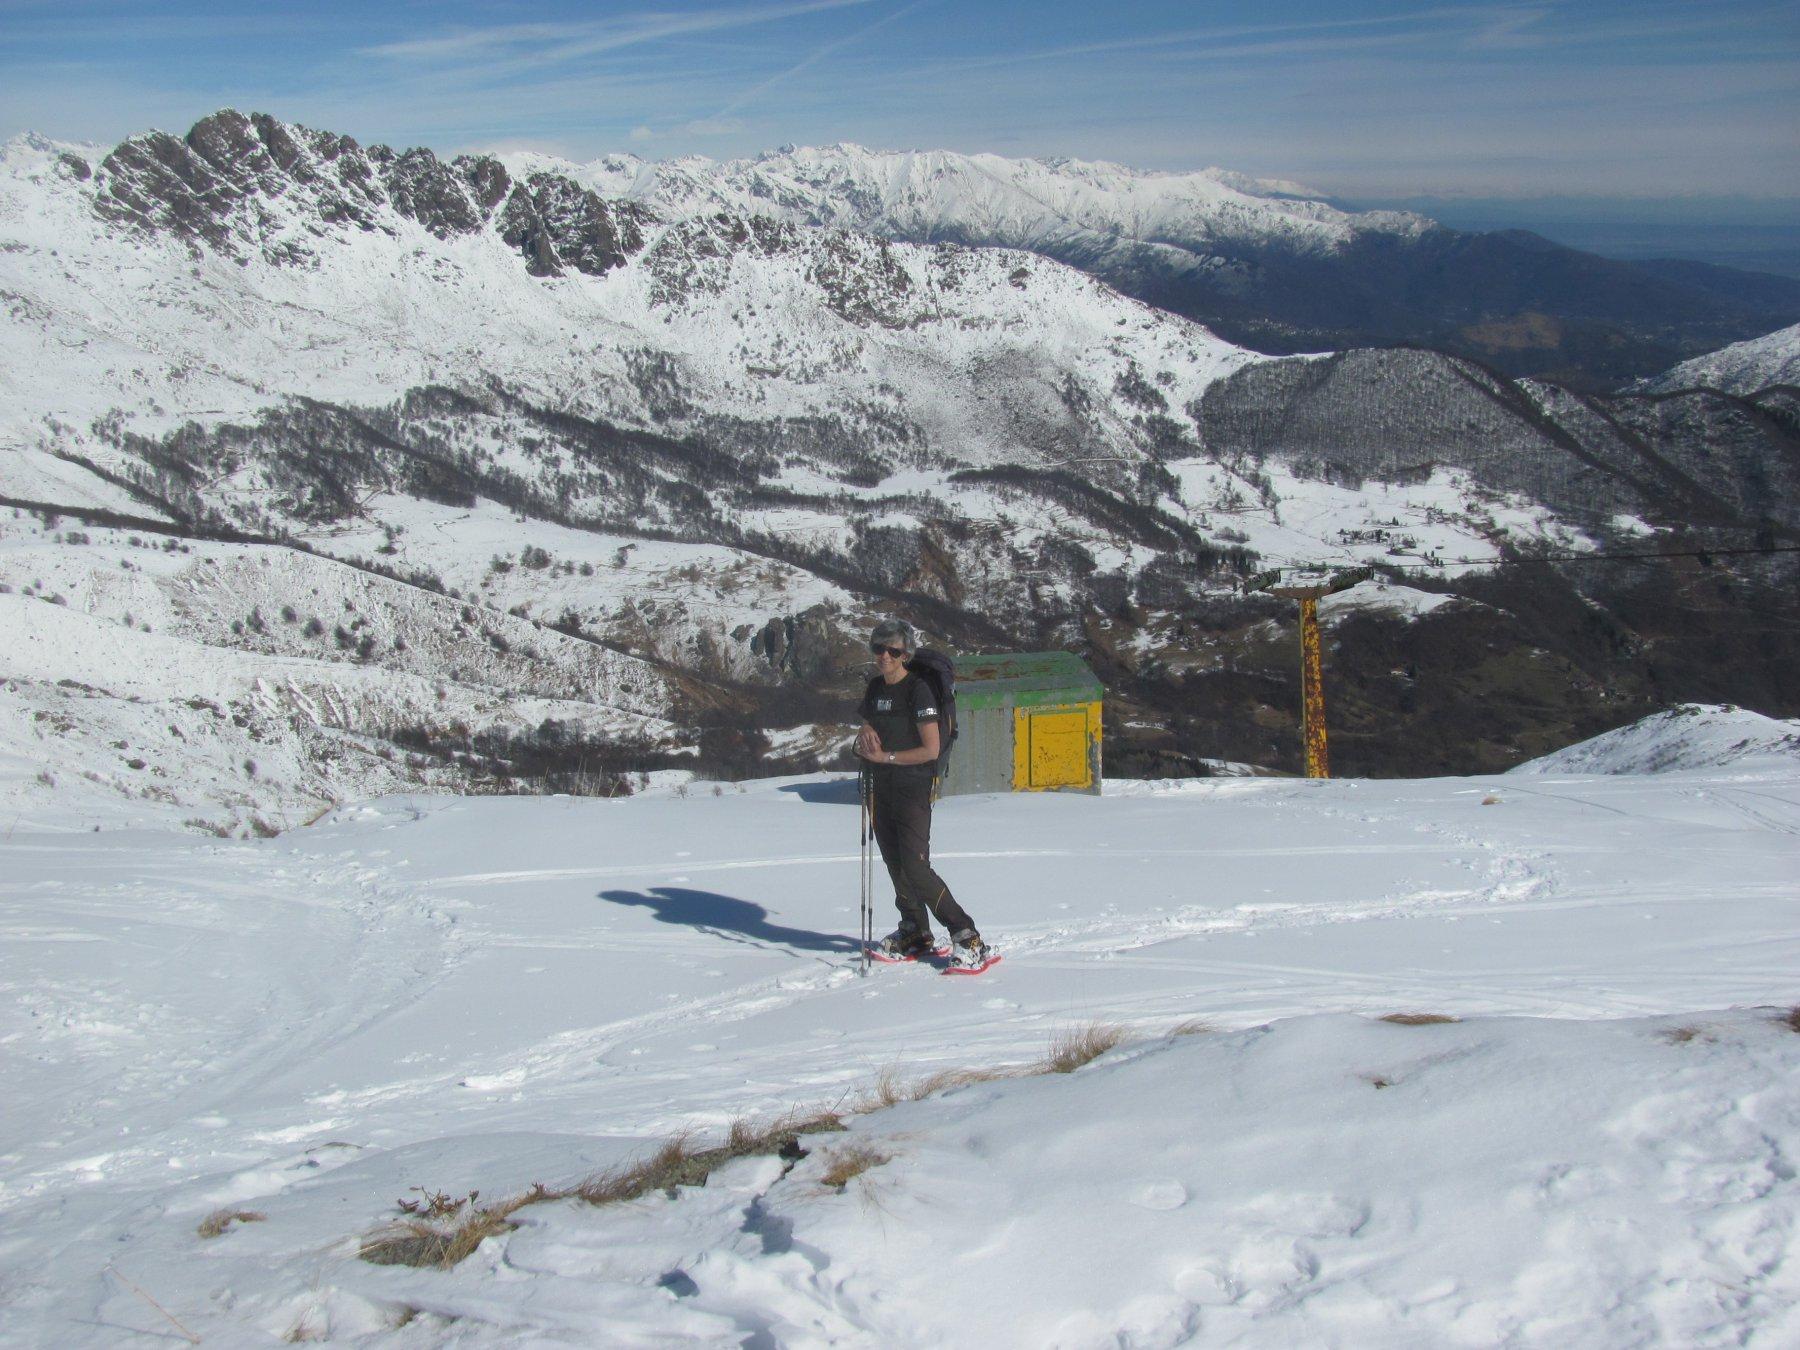 sopra l'arrivo del vecchio skilift